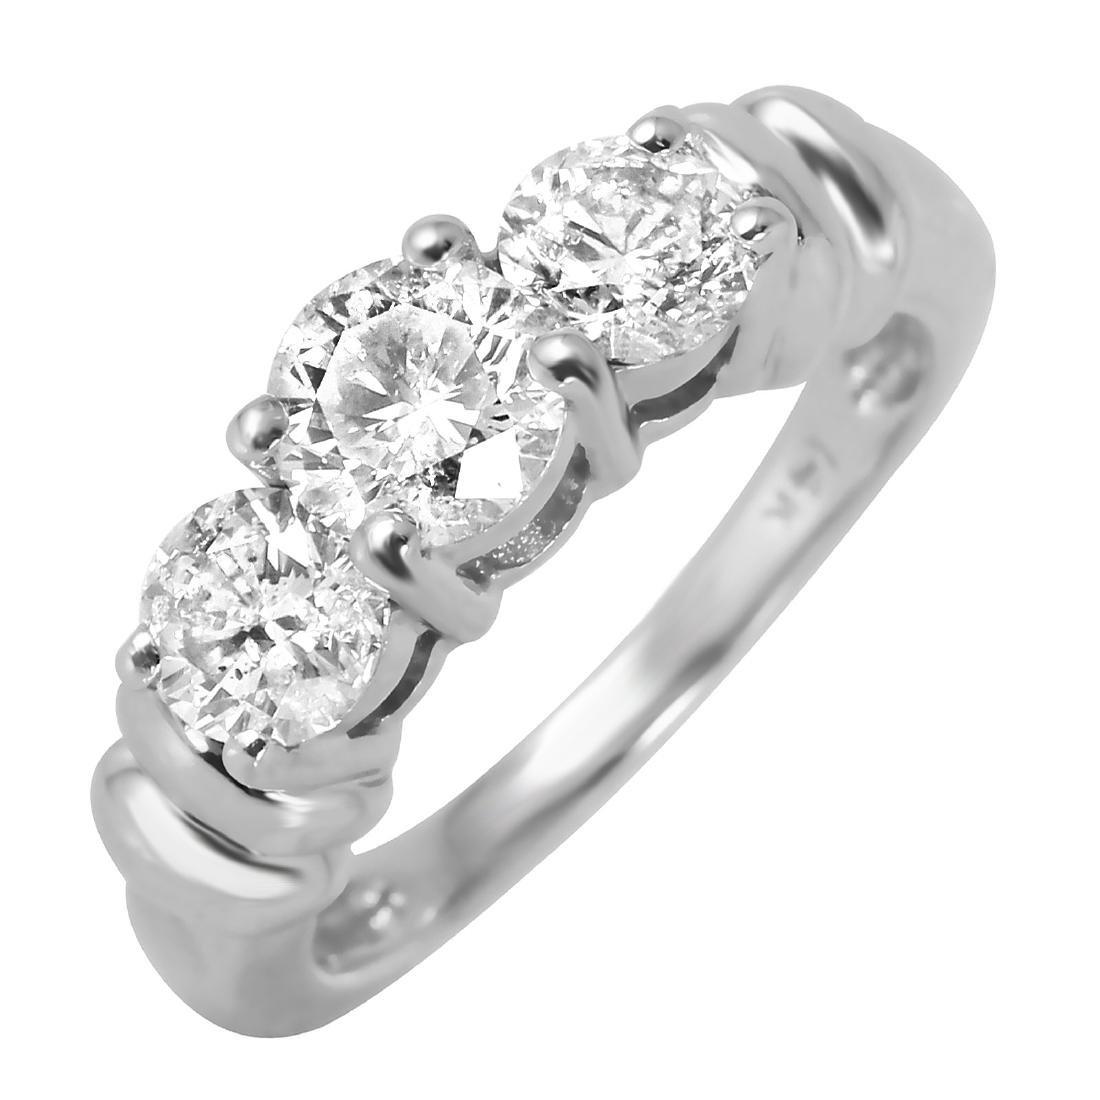 14KT White Gold 1.32ctw Diamond Three Stone Engagement